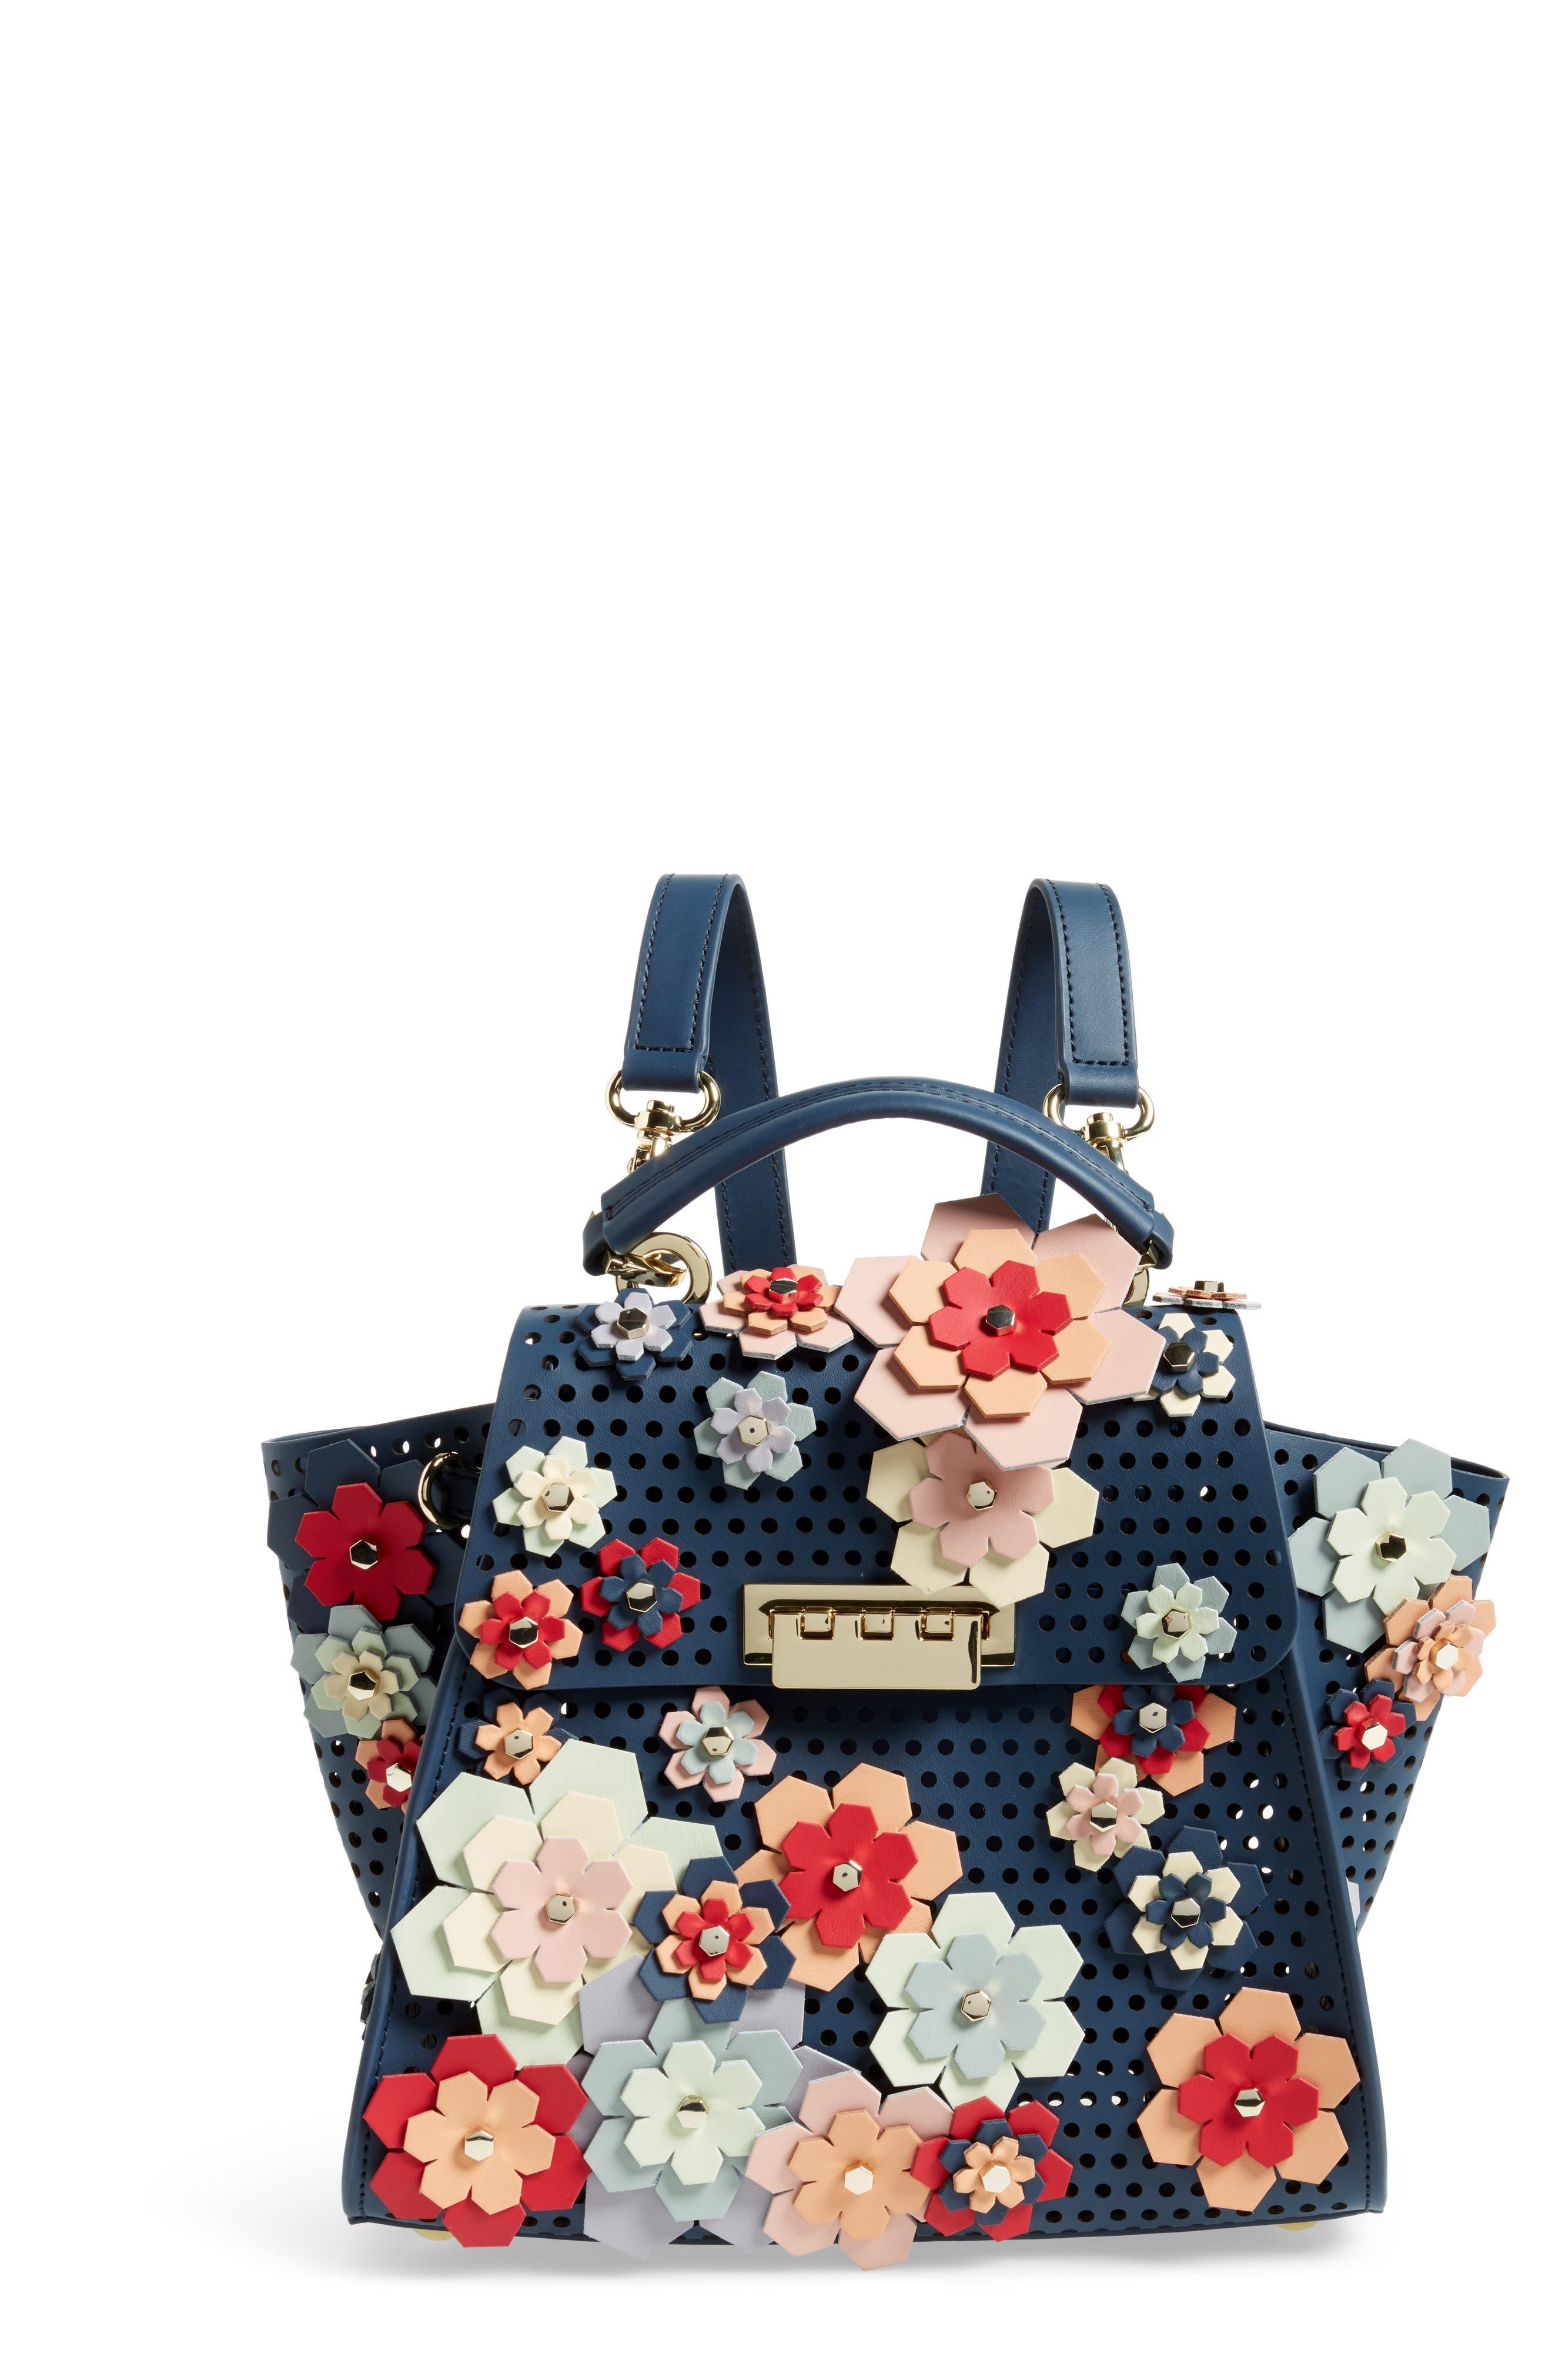 Eartha Kit Convertible Calfskin Leather Backpack,                         Main,                         color, Blue/ Rainbow